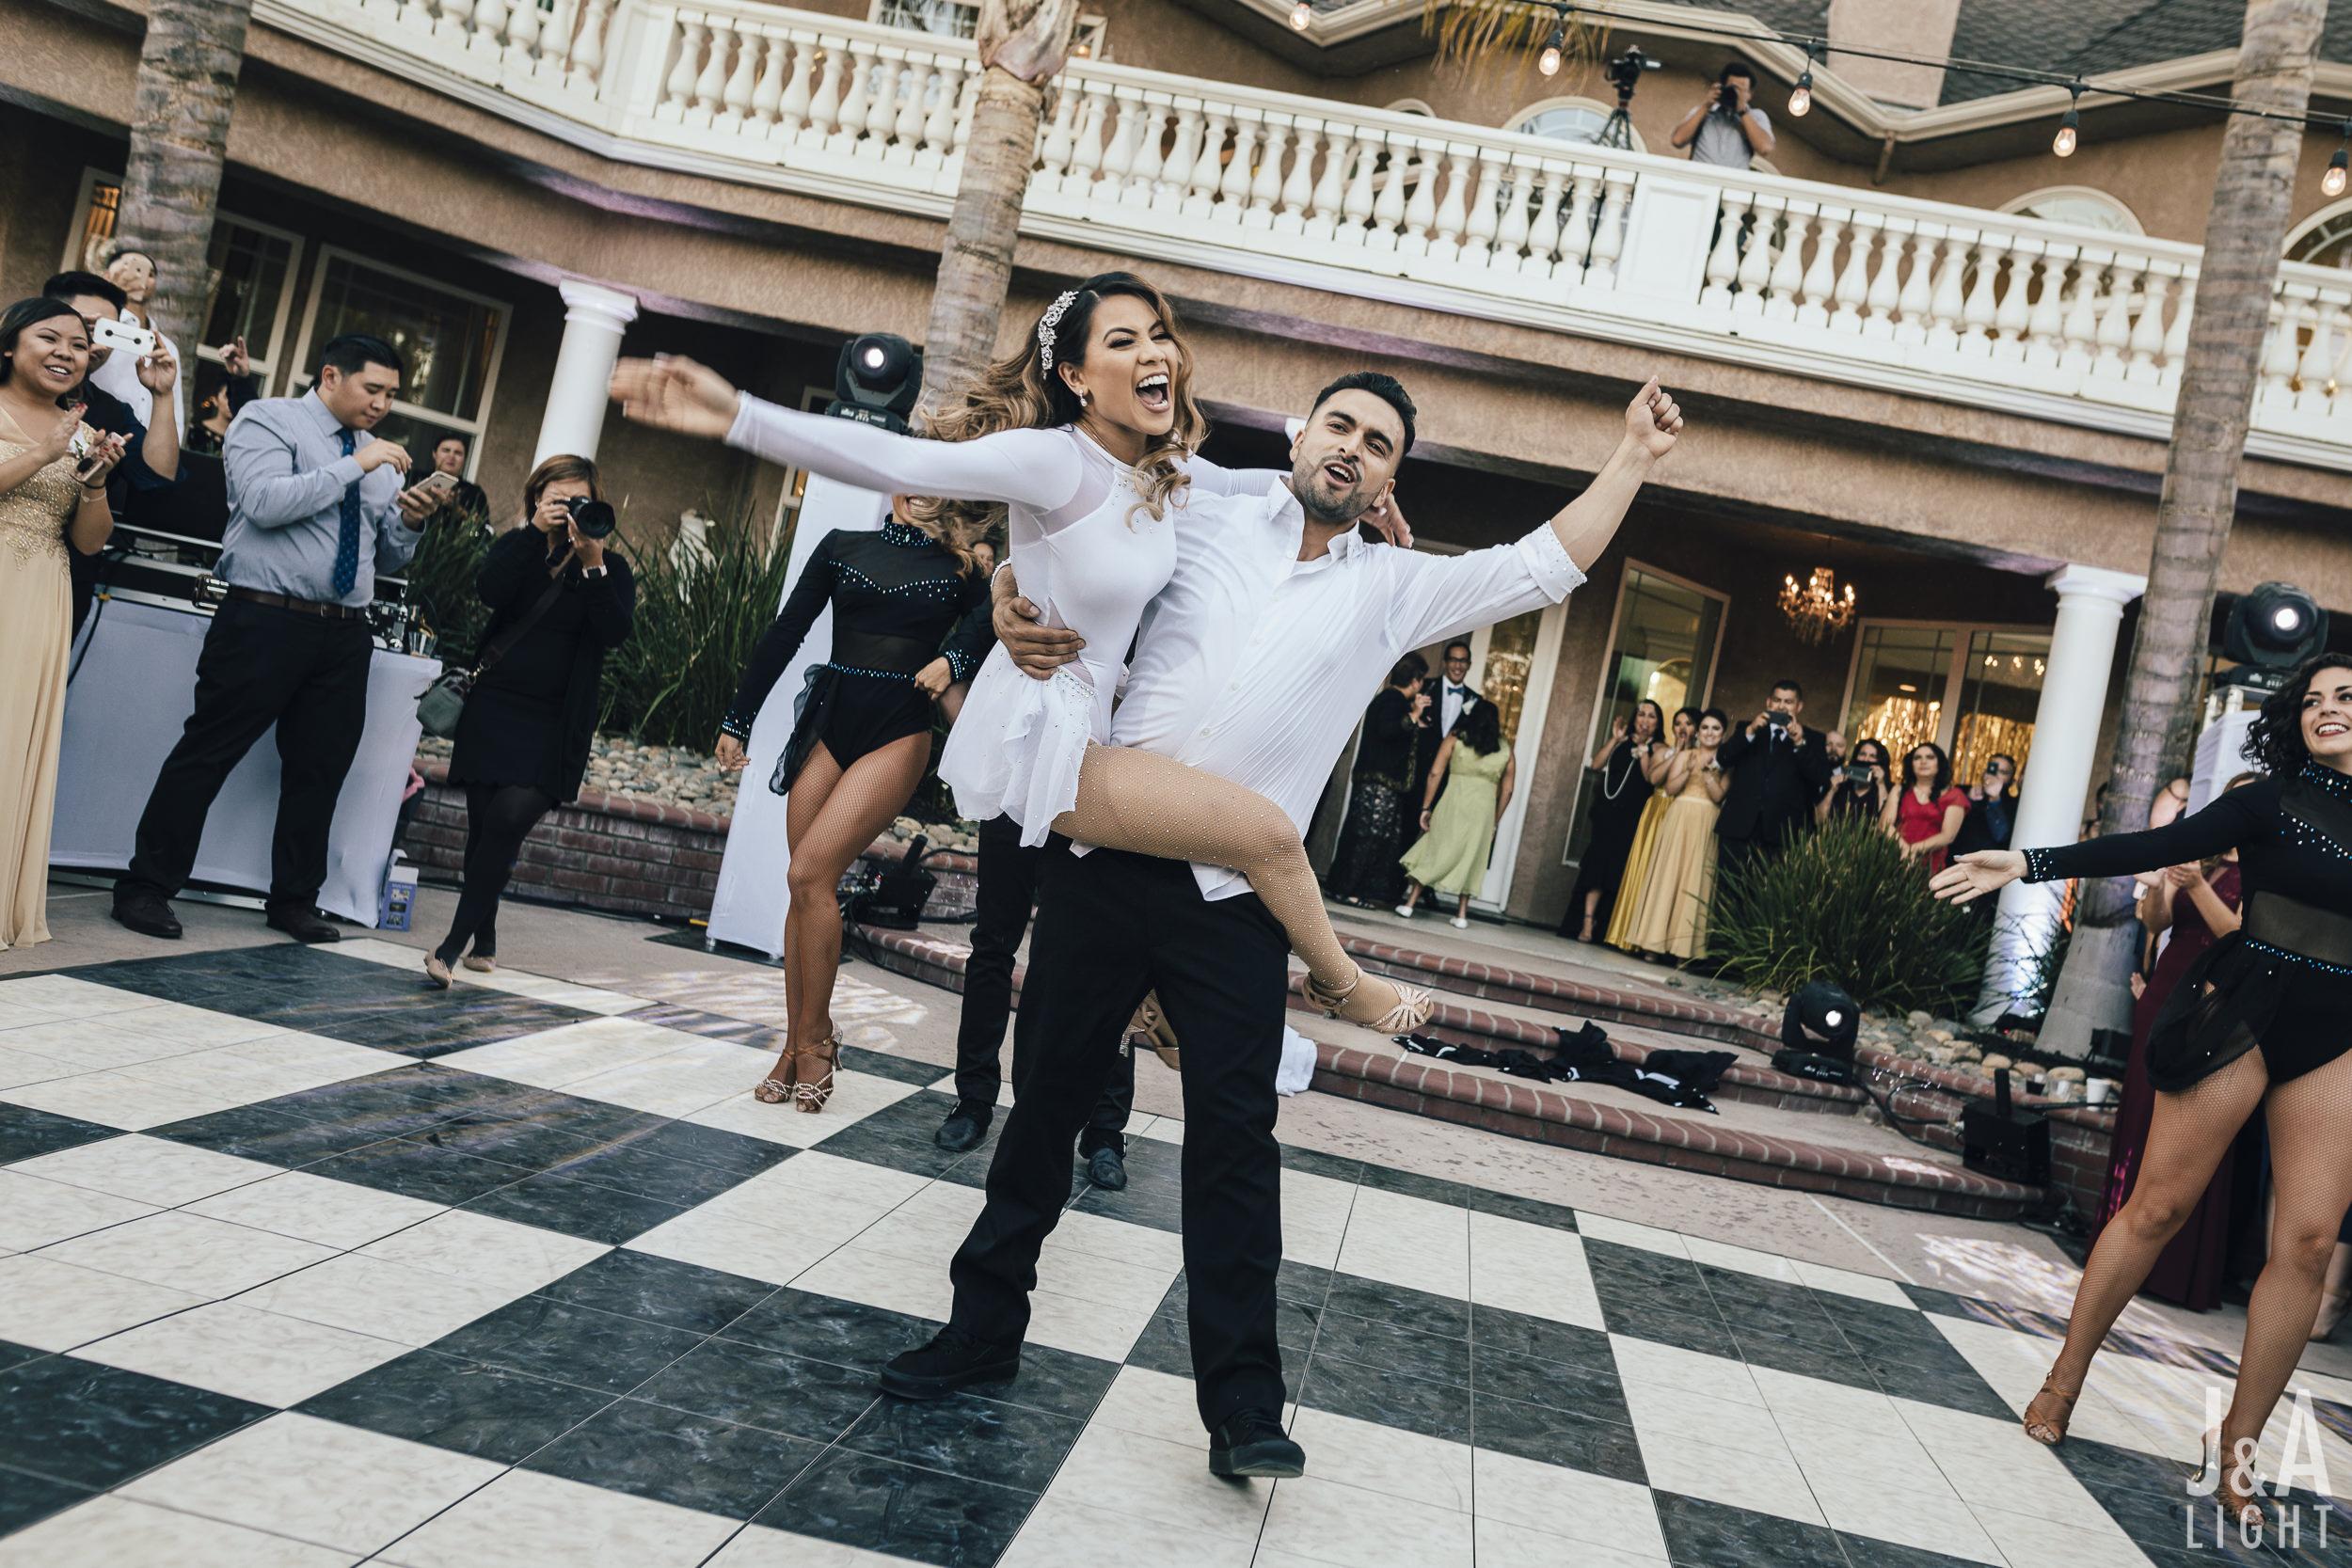 20171014-JanDan-LosBanos-GlassMansion-Wedding-Blog-063.jpg